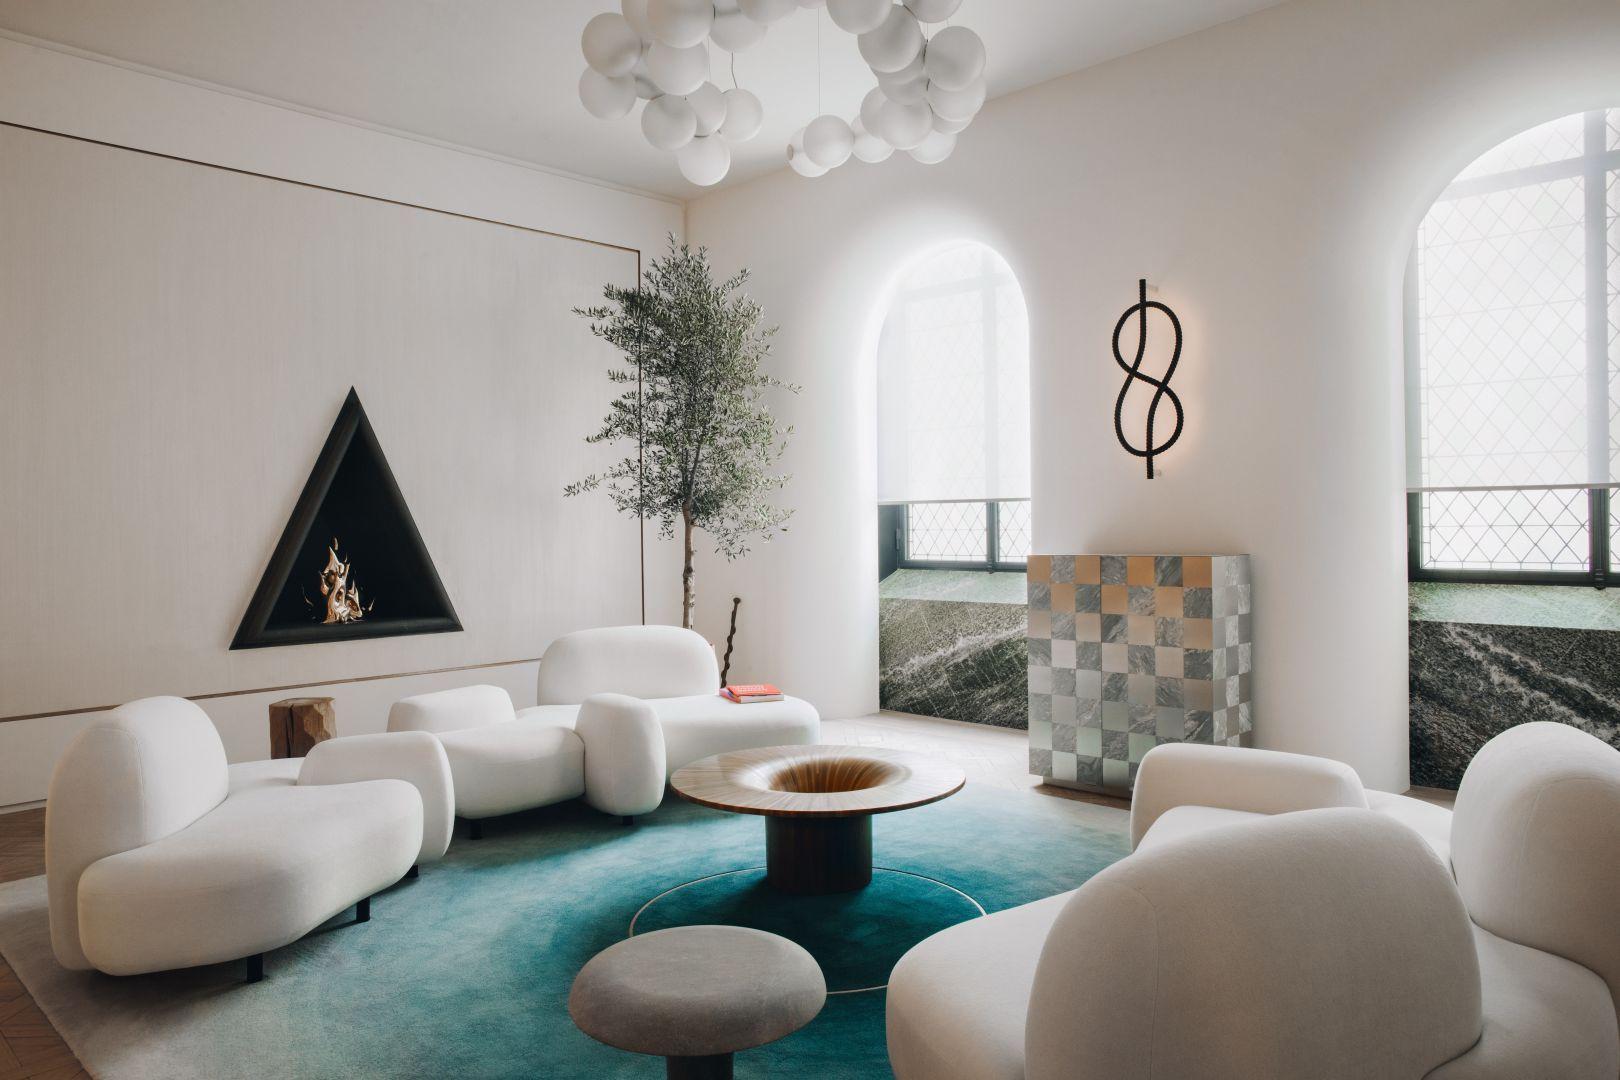 Surprising The Meditation Room Jouffre Ateliers Creatifs In 2019 Cjindustries Chair Design For Home Cjindustriesco